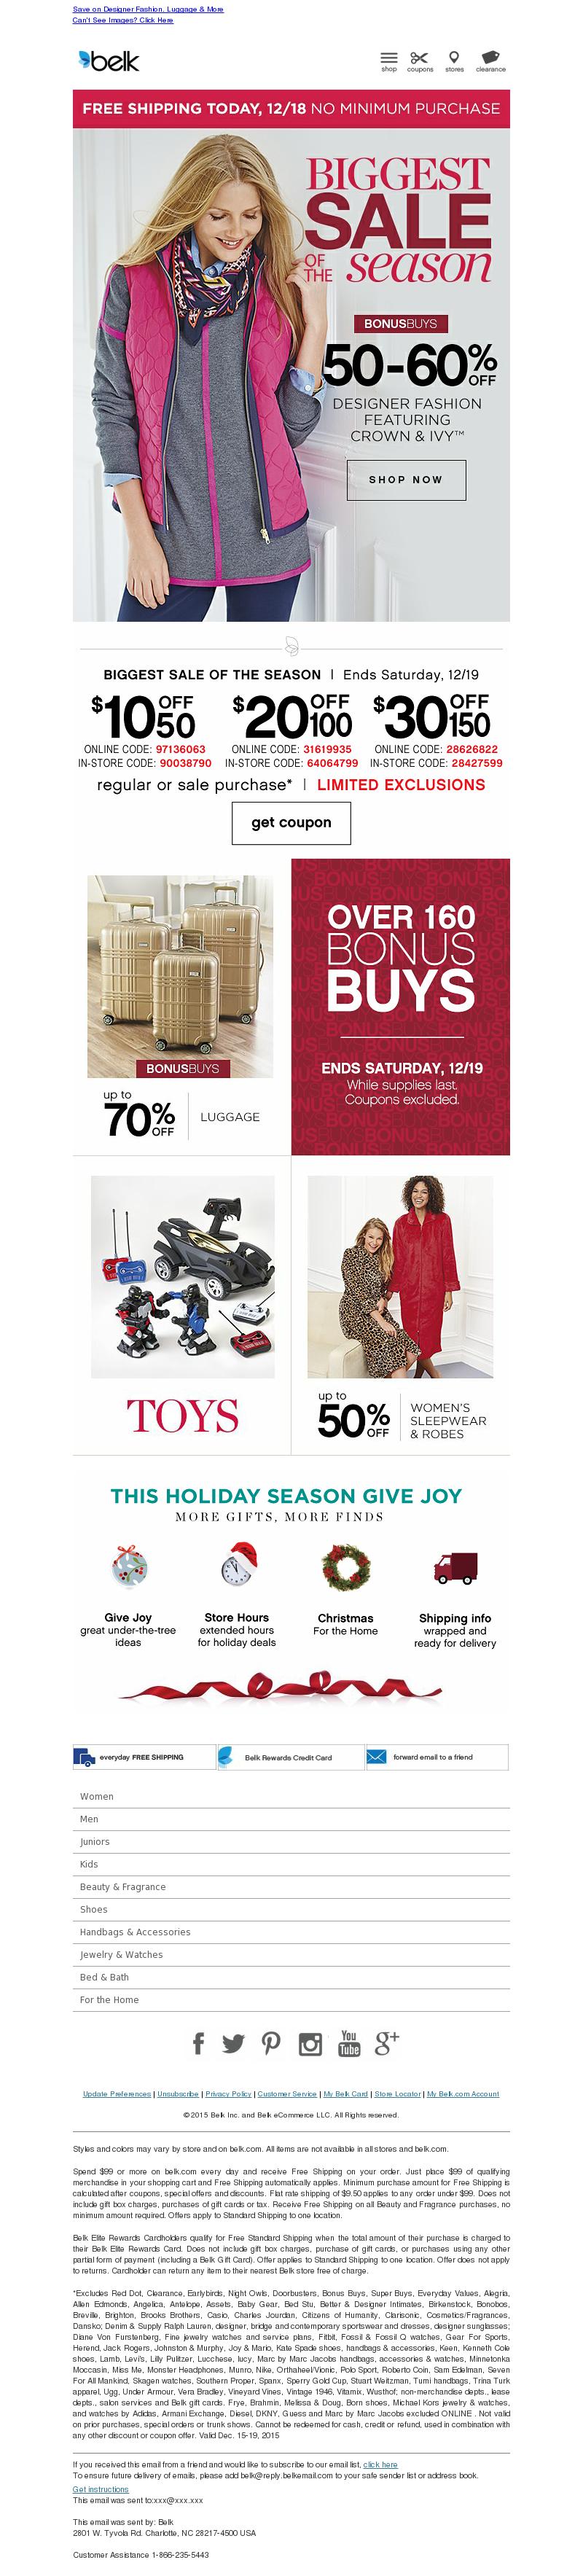 Save on Designer Fashion, Luggage & More Save on Designer Fashion, Luggage